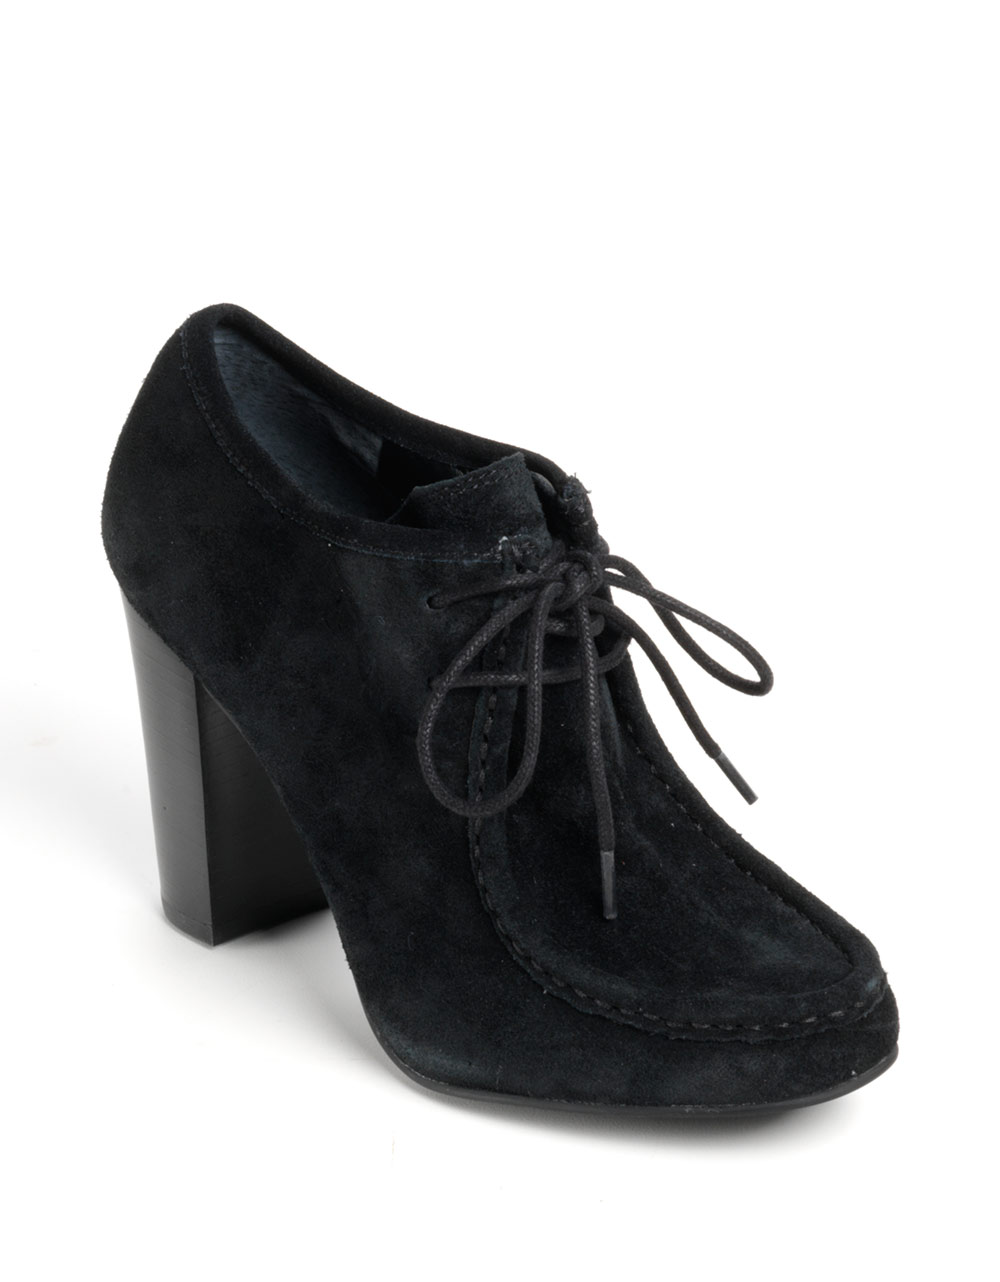 773c8ed7a49c Lauren by Ralph Lauren Samara Suede Ankle Boots in Black - Lyst